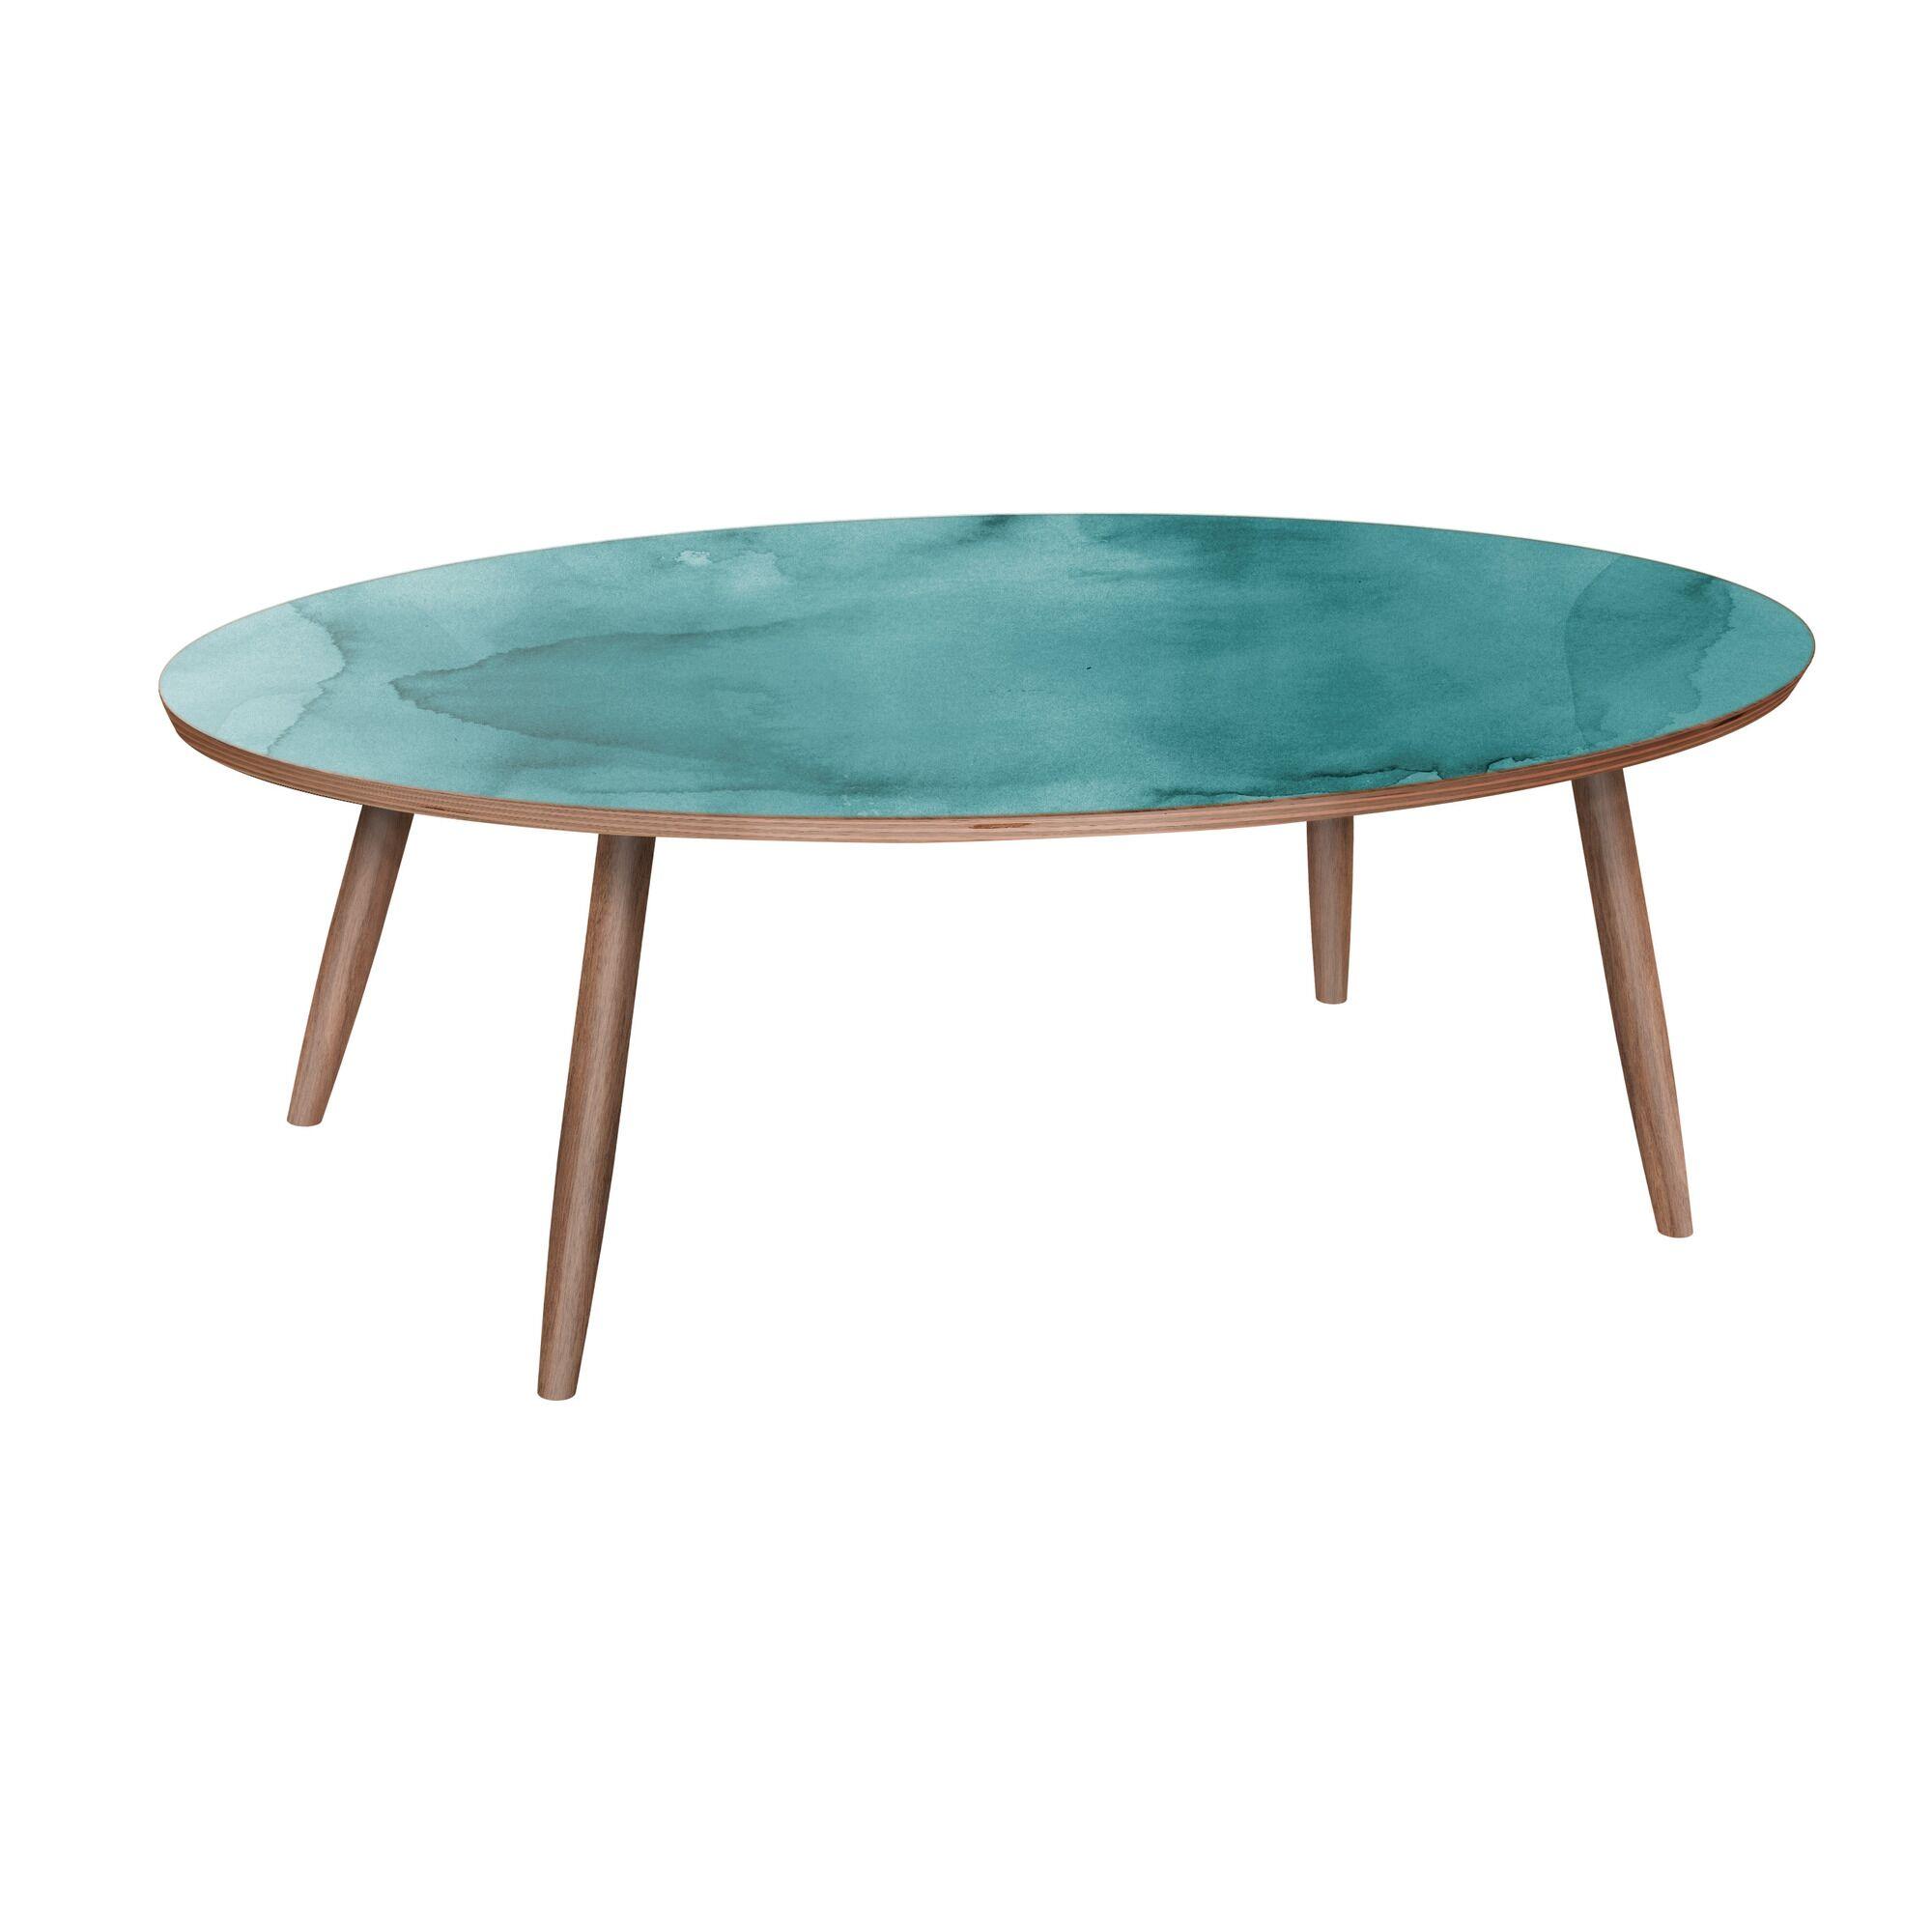 Latosha Coffee Table Table Base Color: Walnut, Table Top Color: Pink